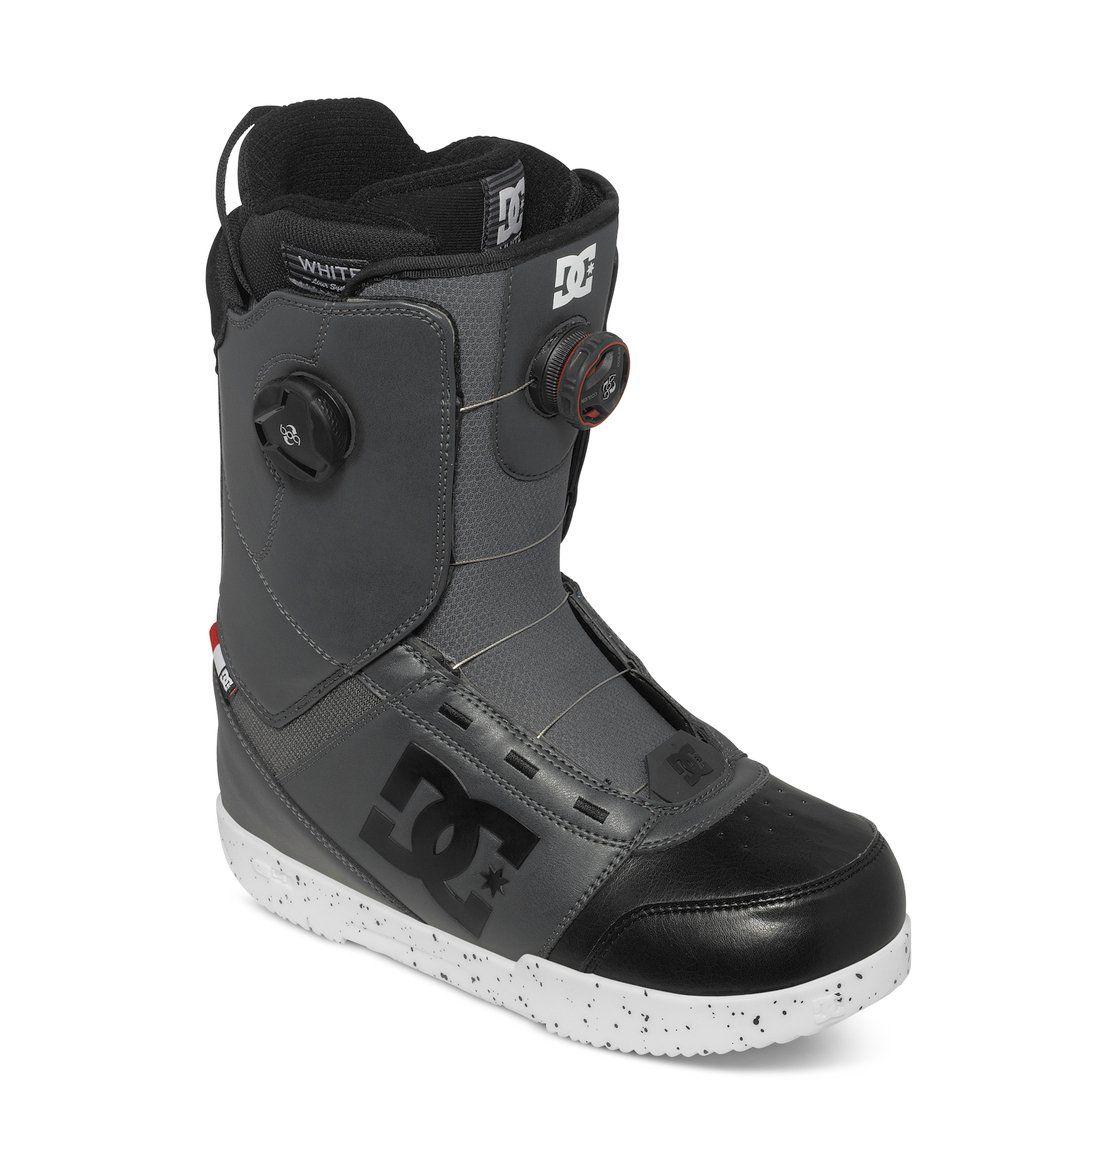 Men S Control Snowboard Boots Adyo100015 Snowboard Boots Boots Snowboard